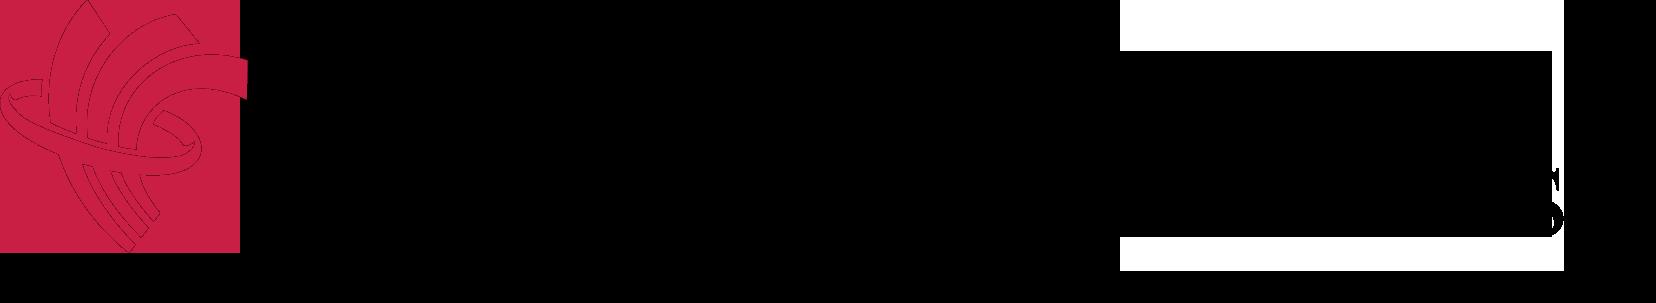 Library Services logomark